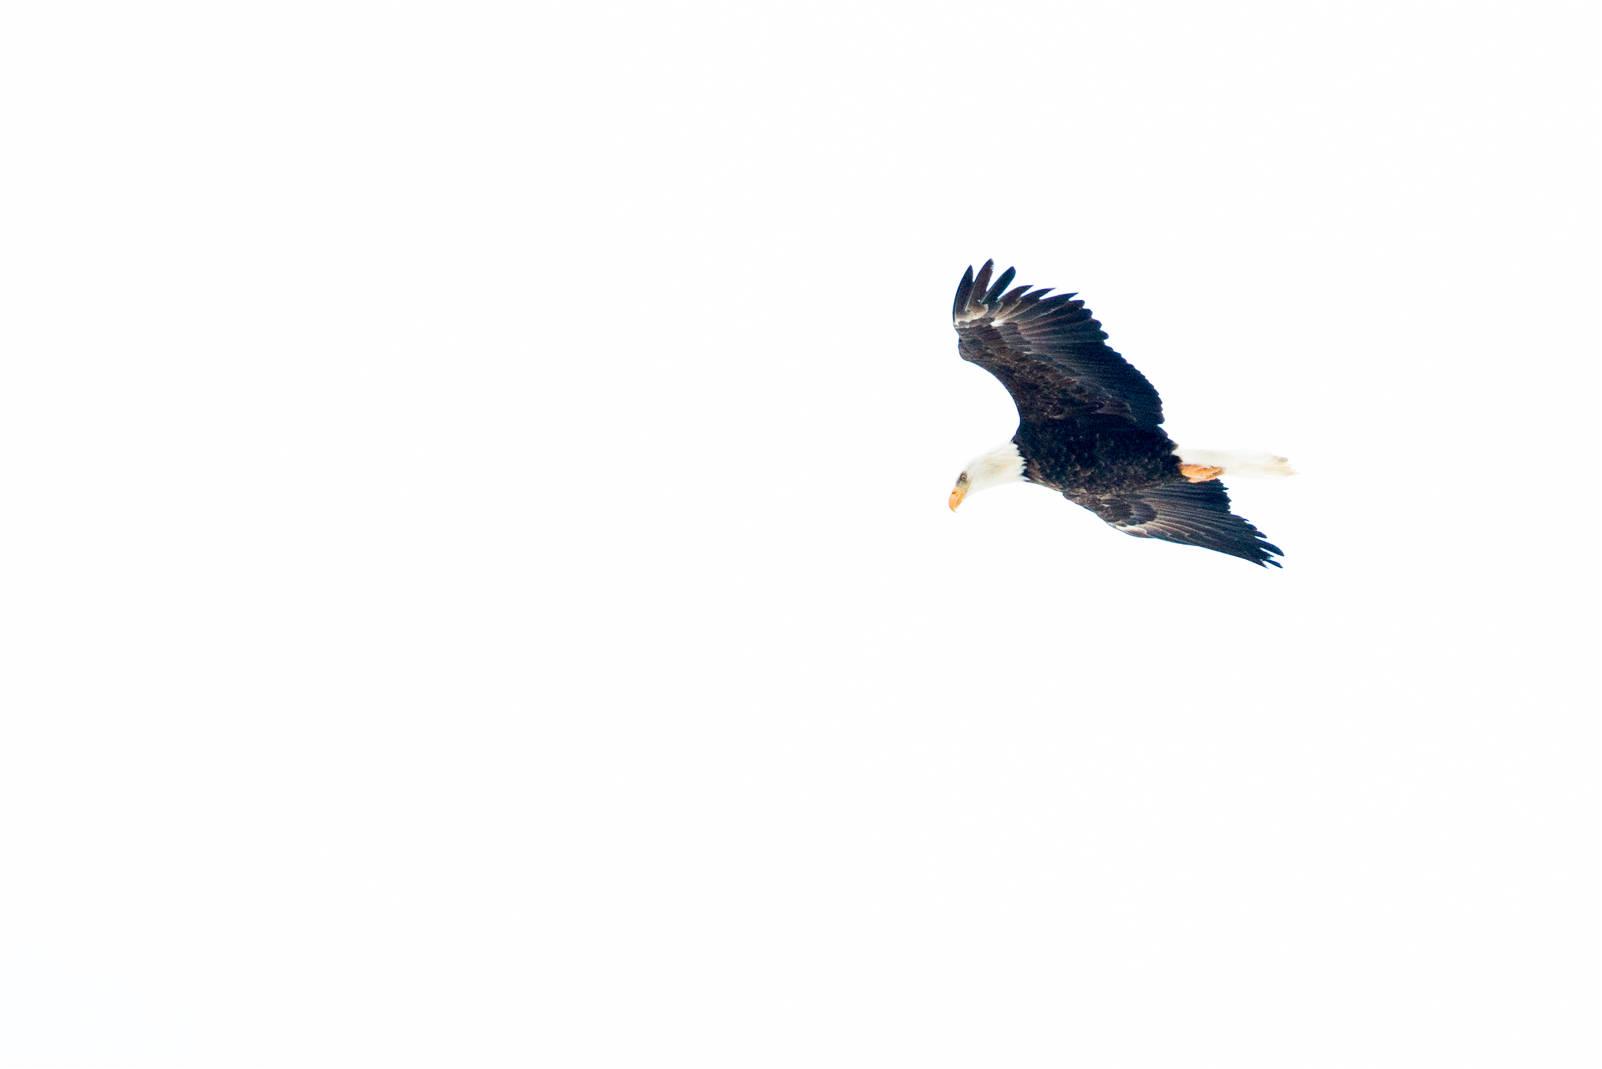 Adult bald eagle in flight - 2013 © Christopher Martin